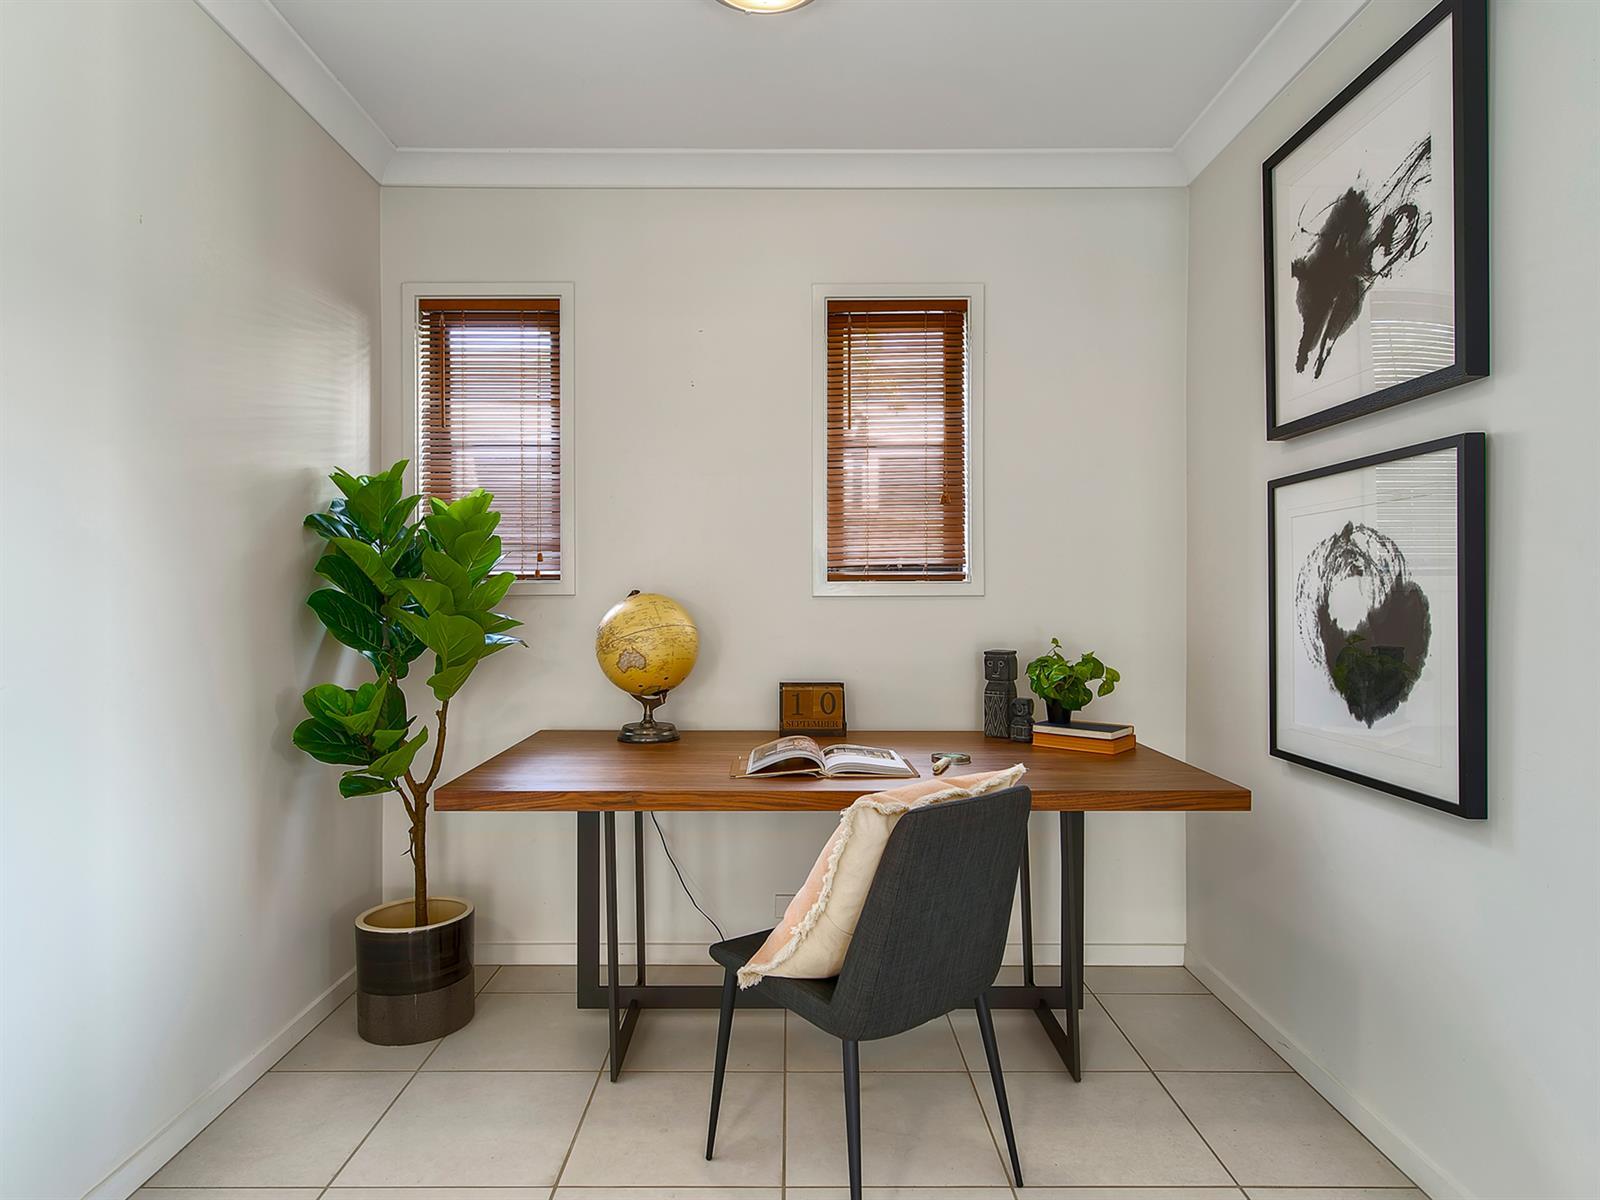 40 Nova Place CARINA QLD 4152 Image 9